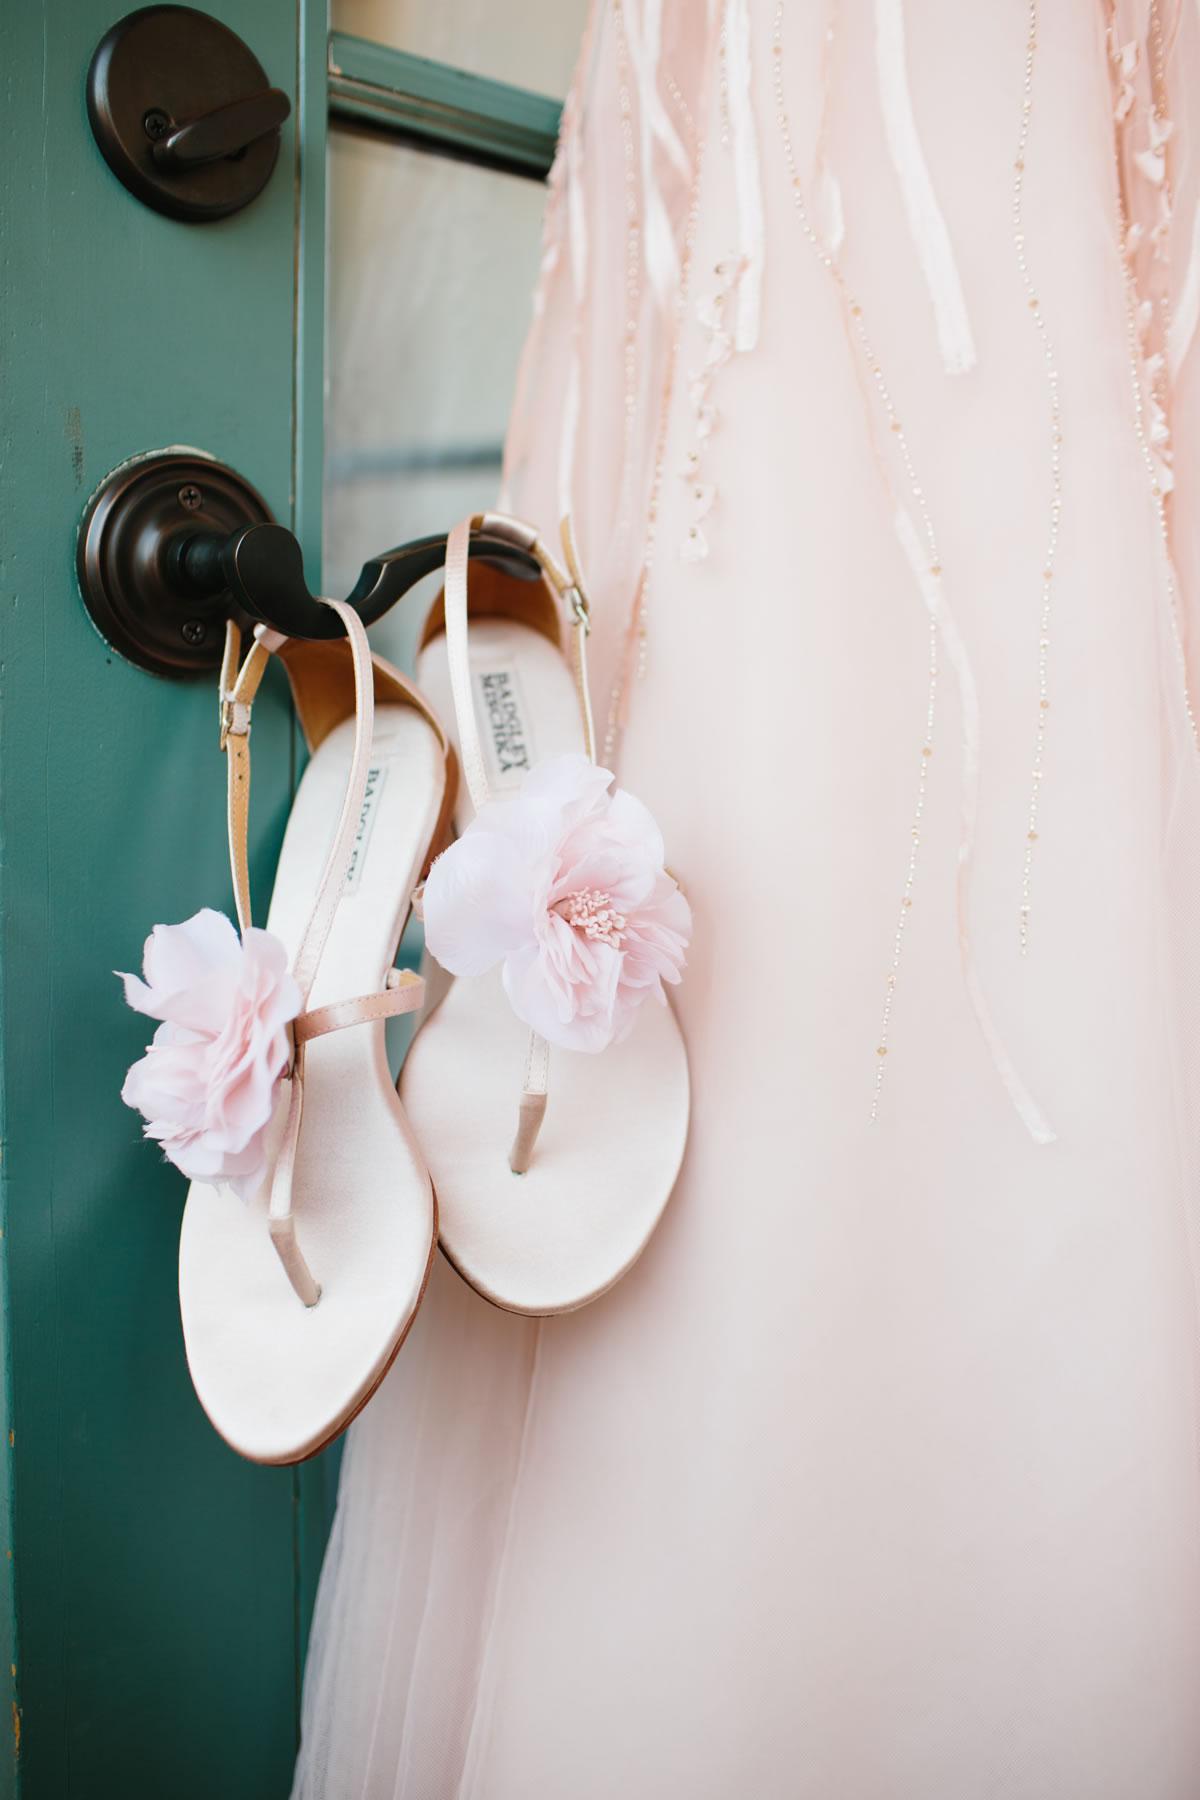 XOXO-BRIDE-Marianne-Wilson-Photography-JD-Details-027-3351719941-O